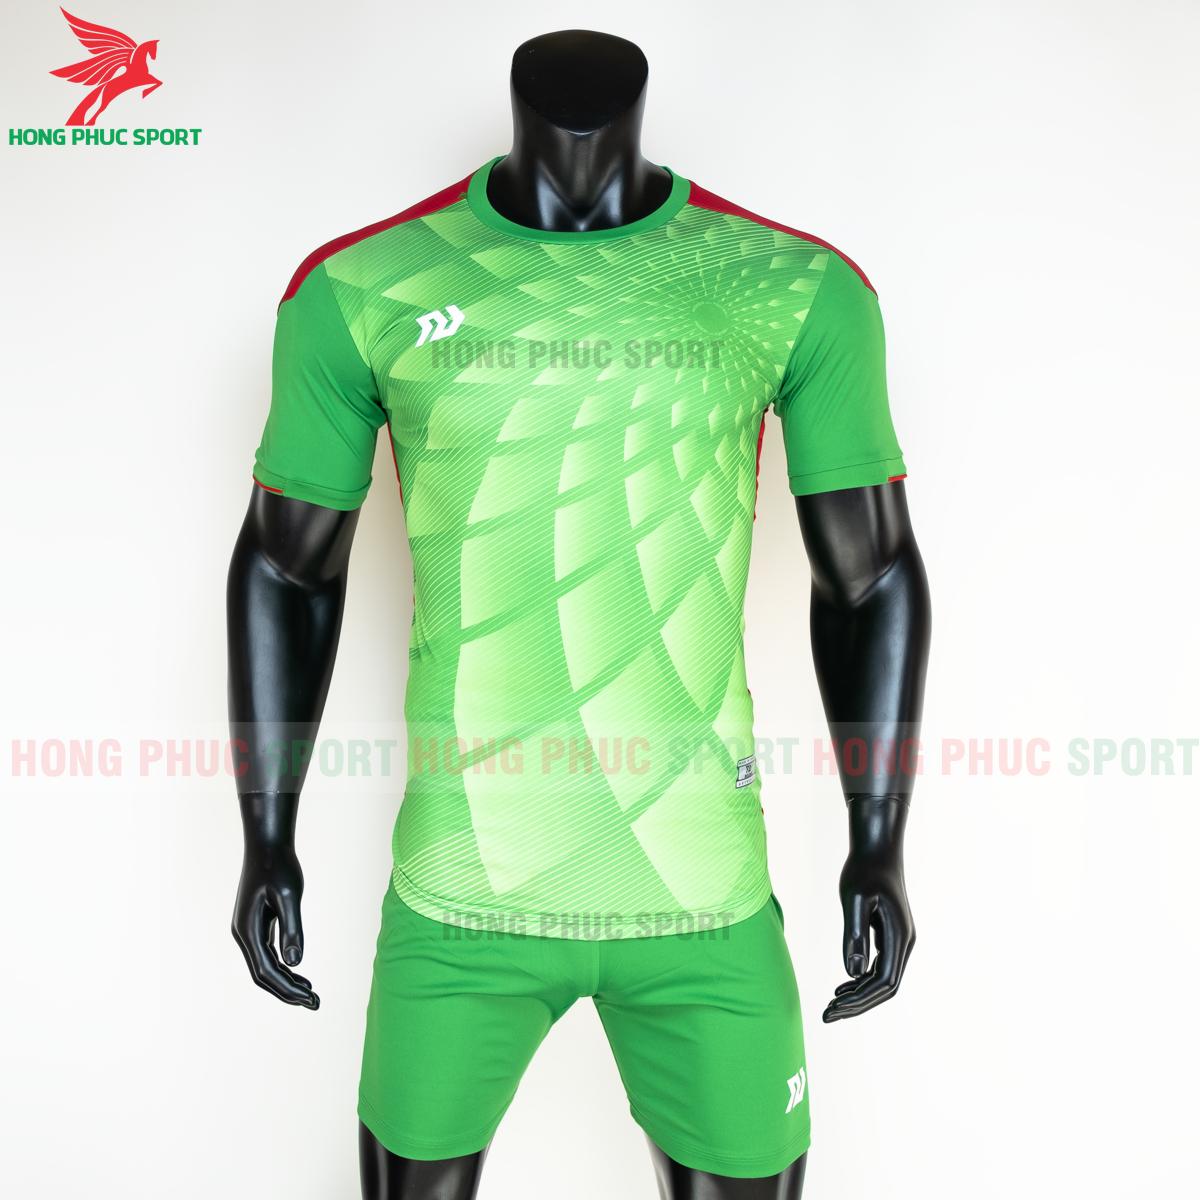 https://cdn.hongphucsport.com/unsafe/s4.shopbay.vn/files/285/ao-bong-da-khong-logo-bulbal-lotus-mau-xanh-la-2-6050114963e6a.png